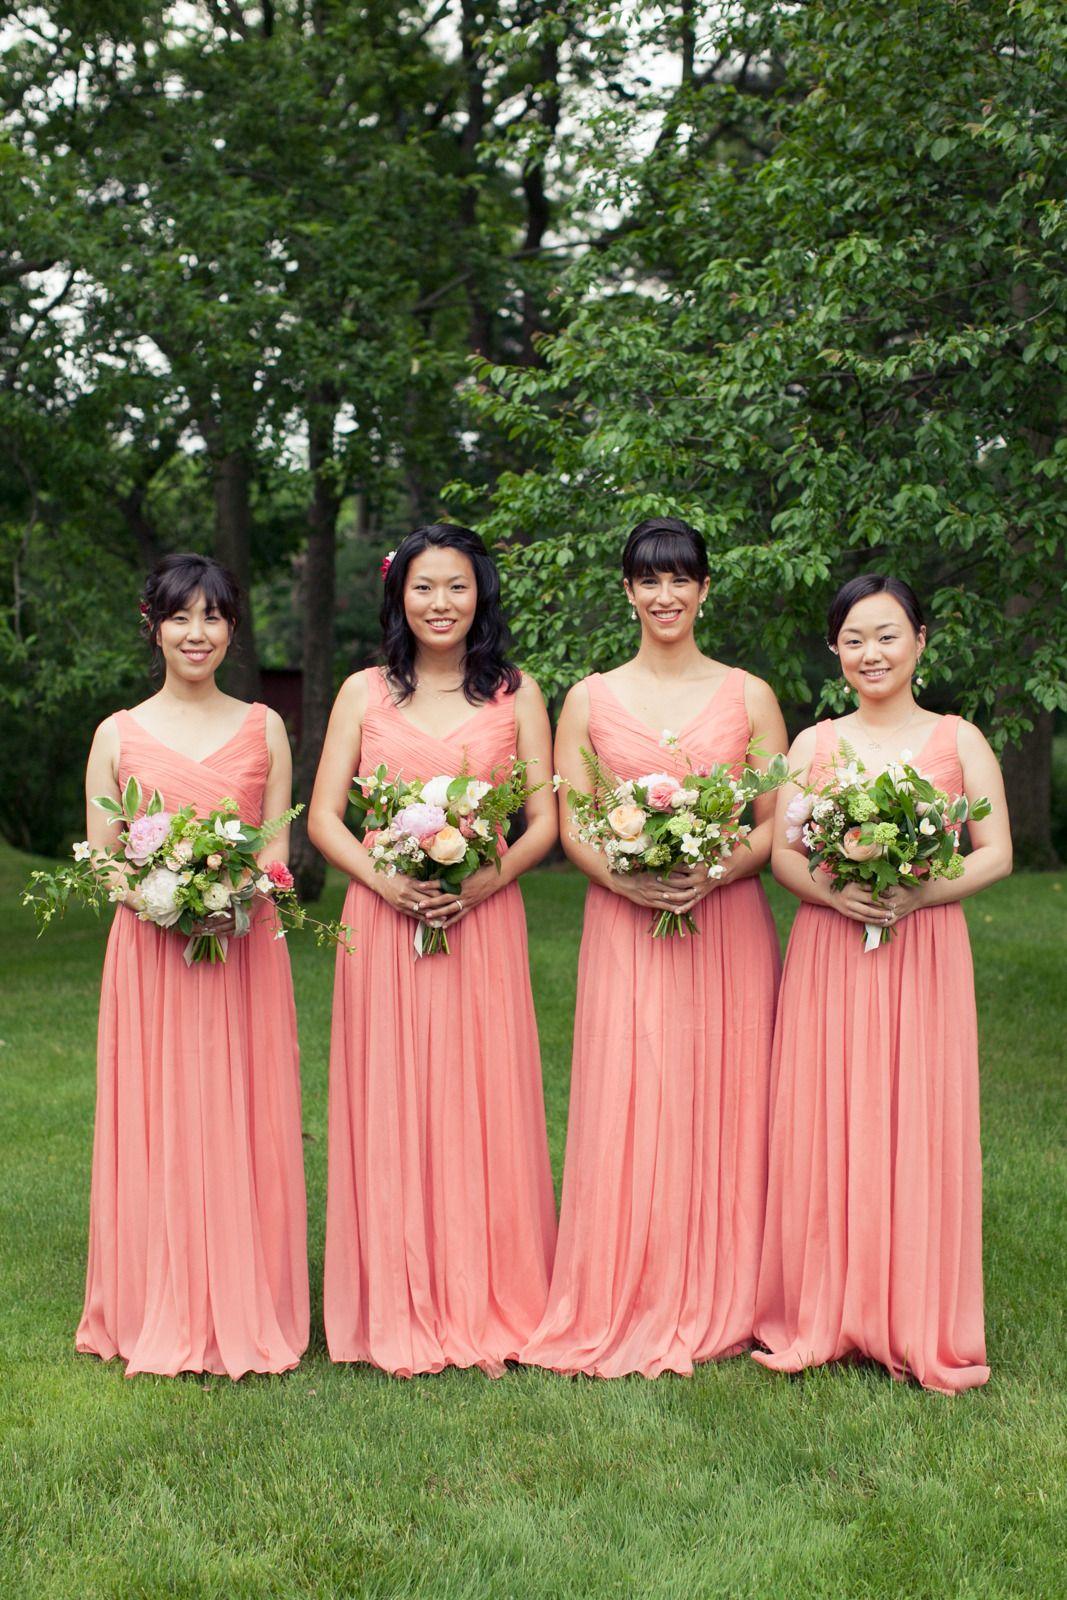 Long Island Backyard Wedding from Isabelle